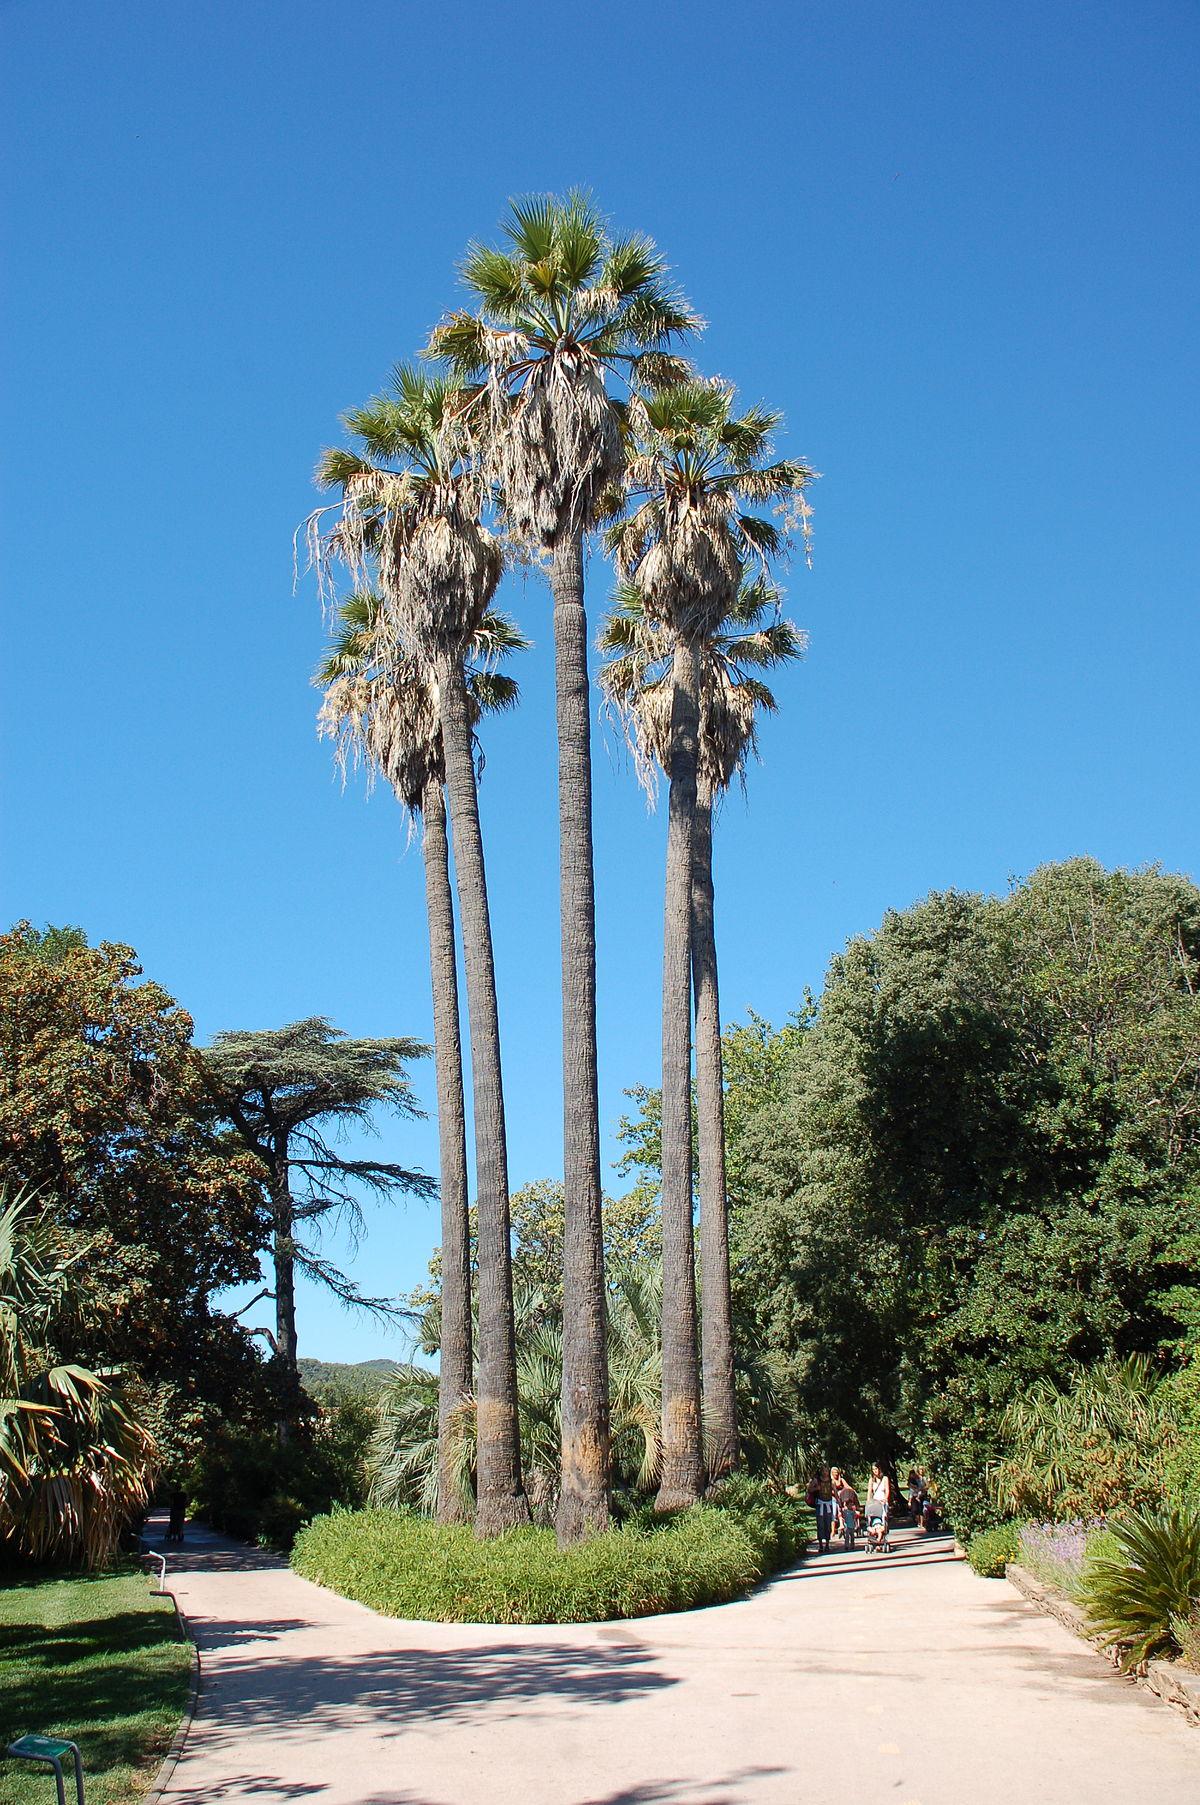 Parque olbius riquier wikipedia la enciclopedia libre for Jardin olbius riquier